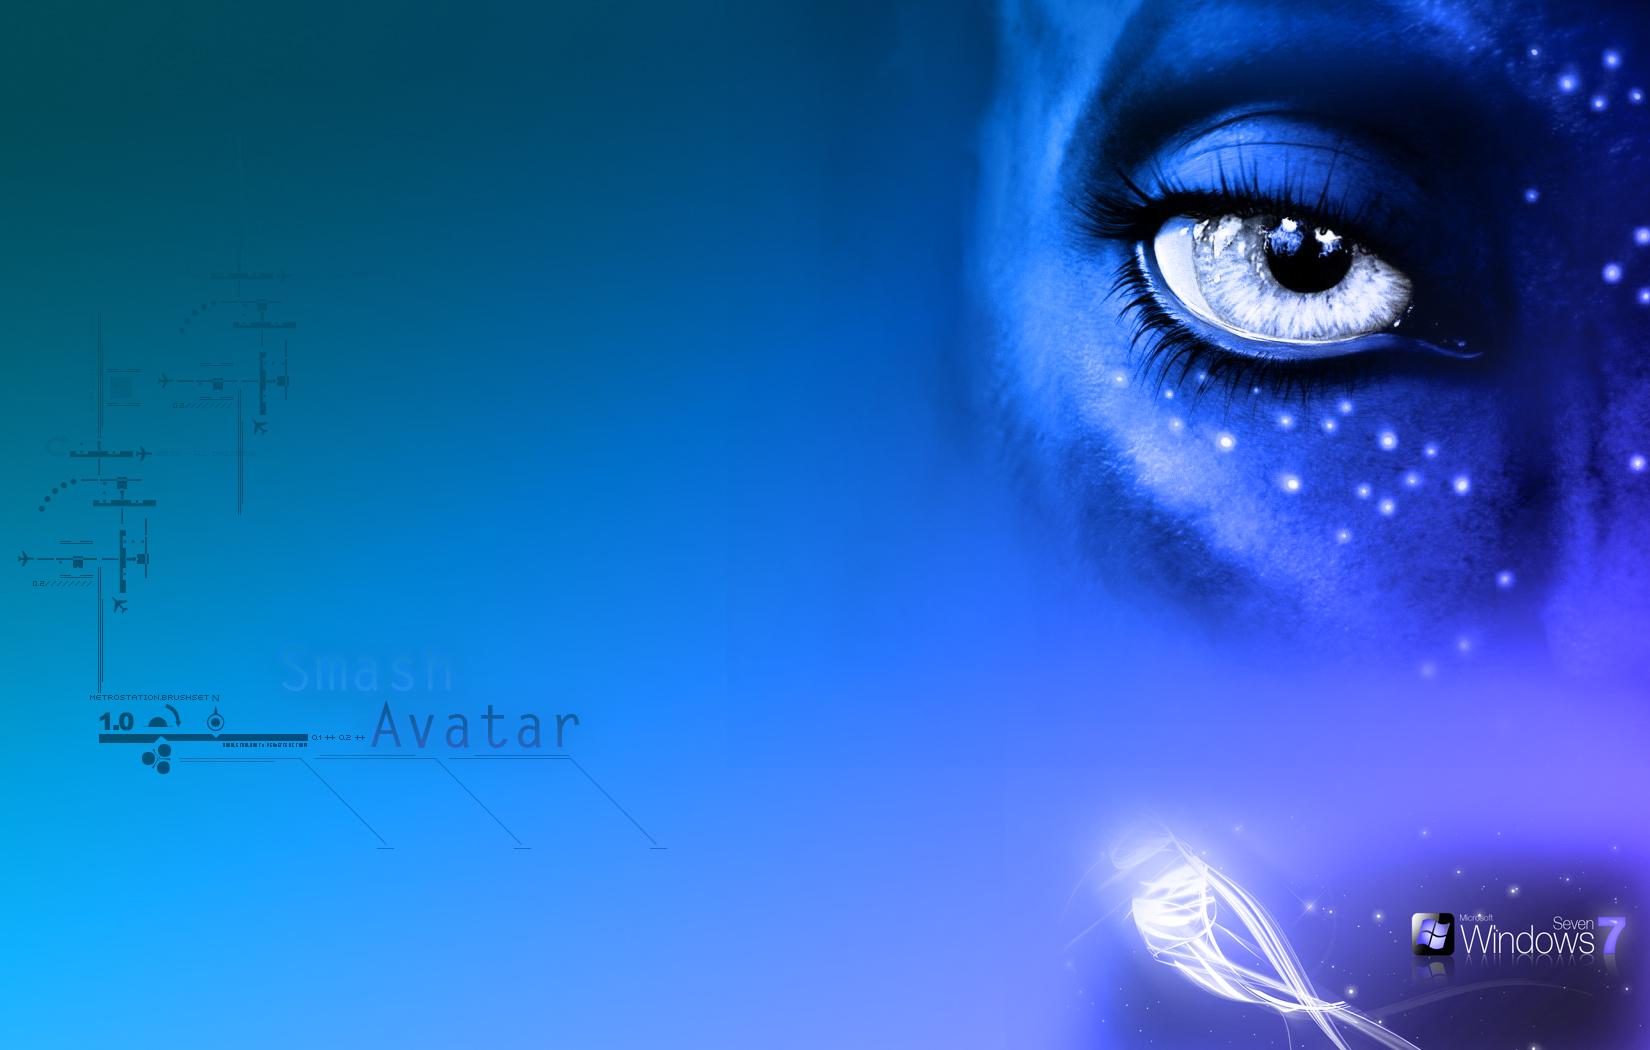 Avatar Wallpaper Windows 7 By Ashleysmash On Deviantart